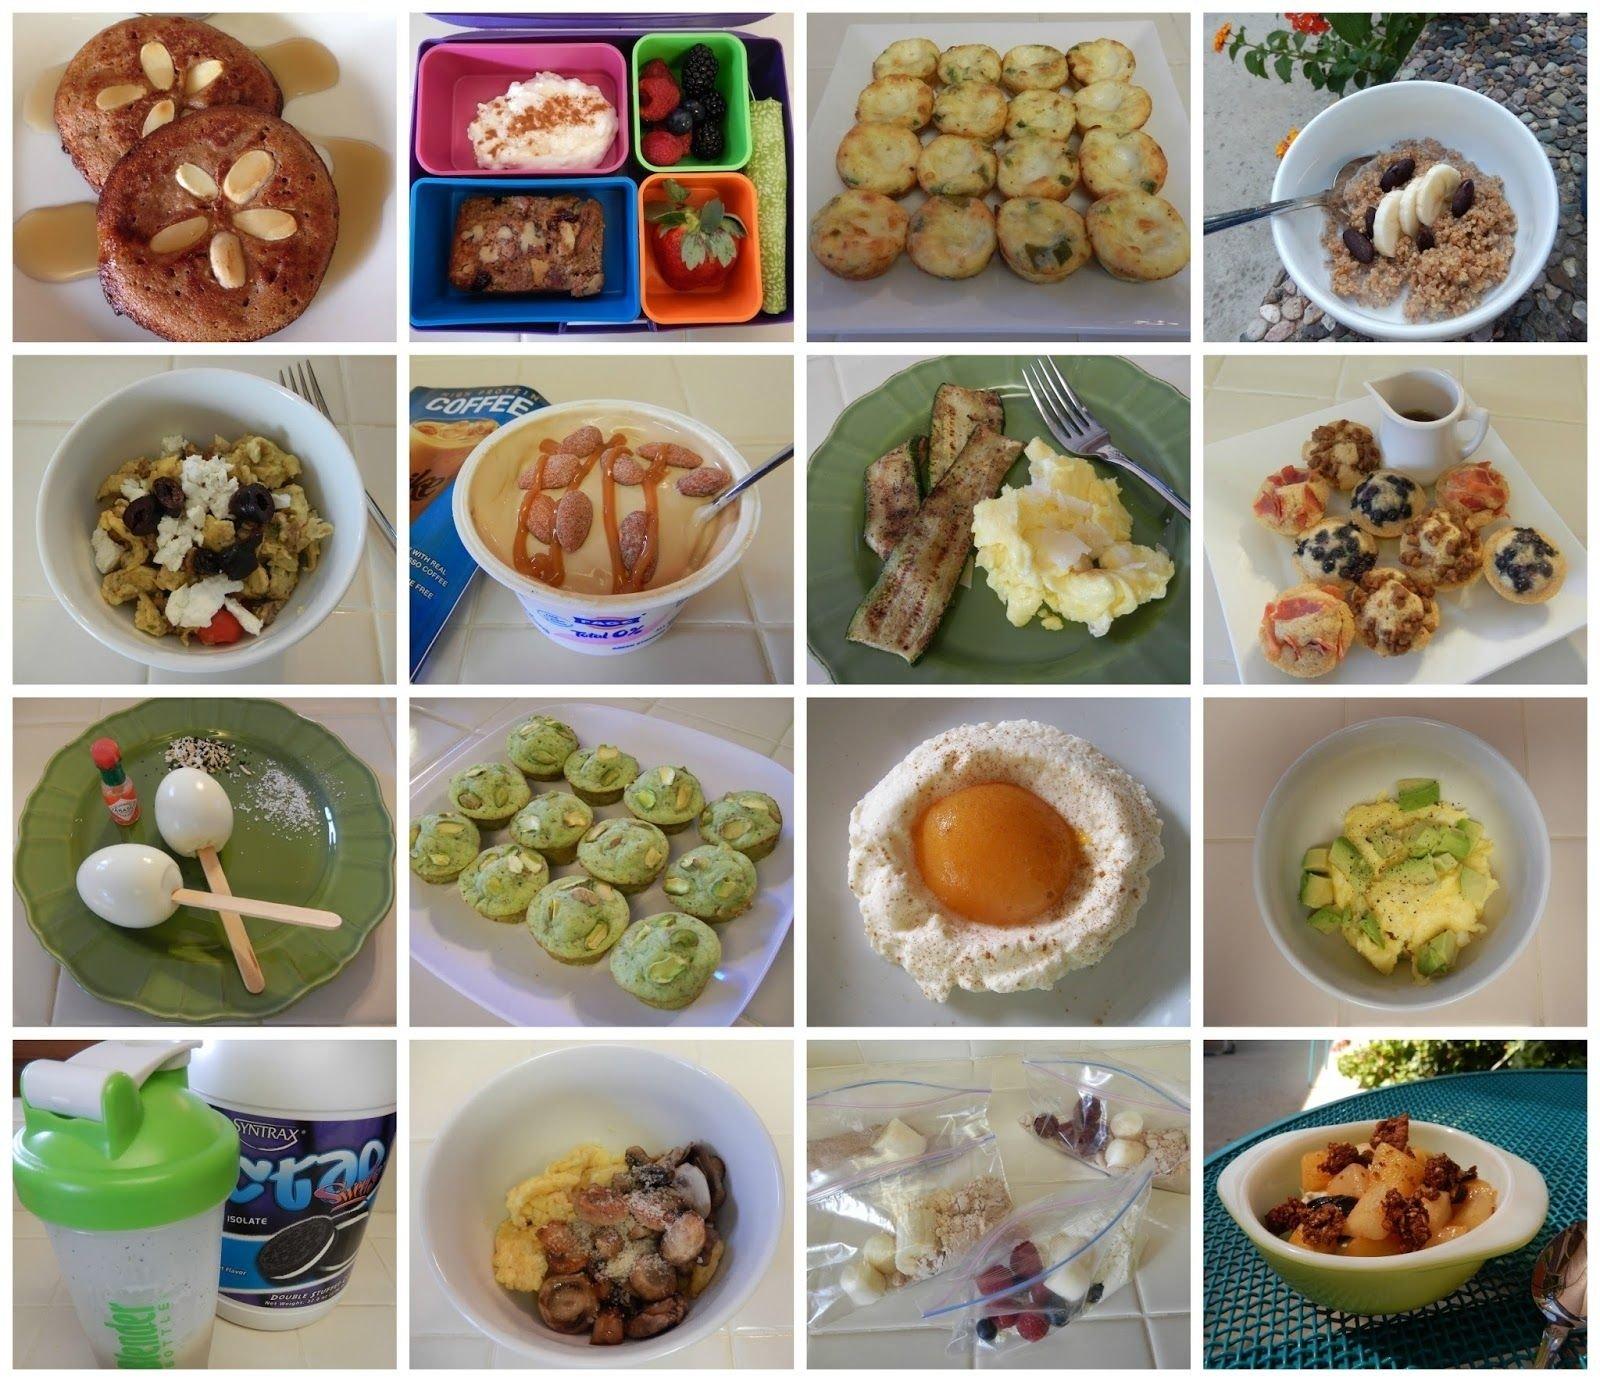 10 Stunning Breakfast Ideas For Losing Weight oodles of healthy breakfast ideas post wls breakfasts pinterest 1 2020